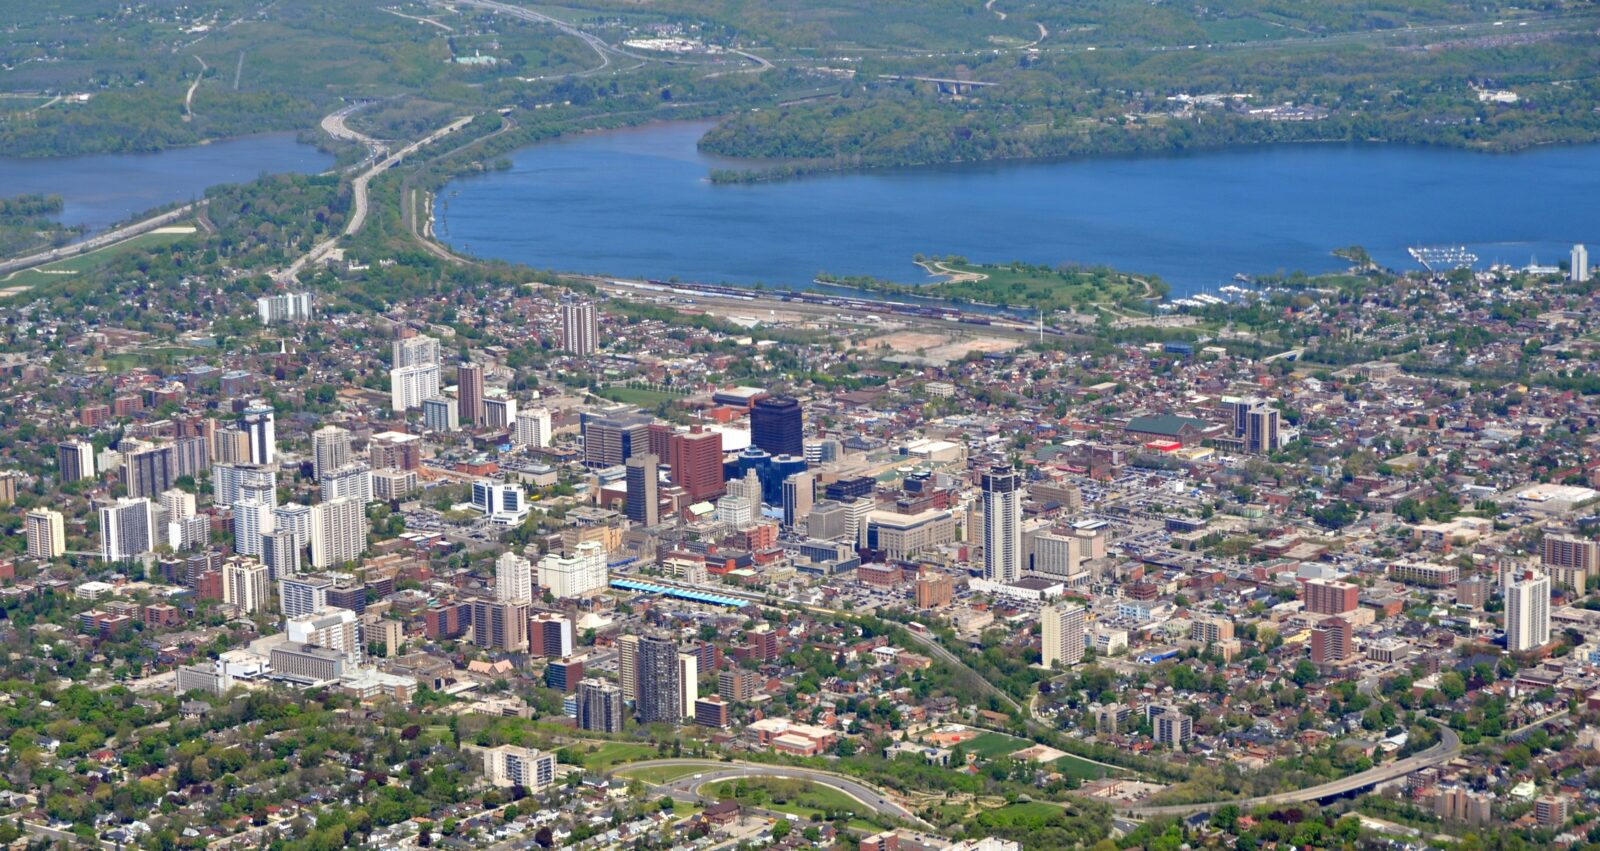 Panorama aerial view of downtown Hamilton, Ontario